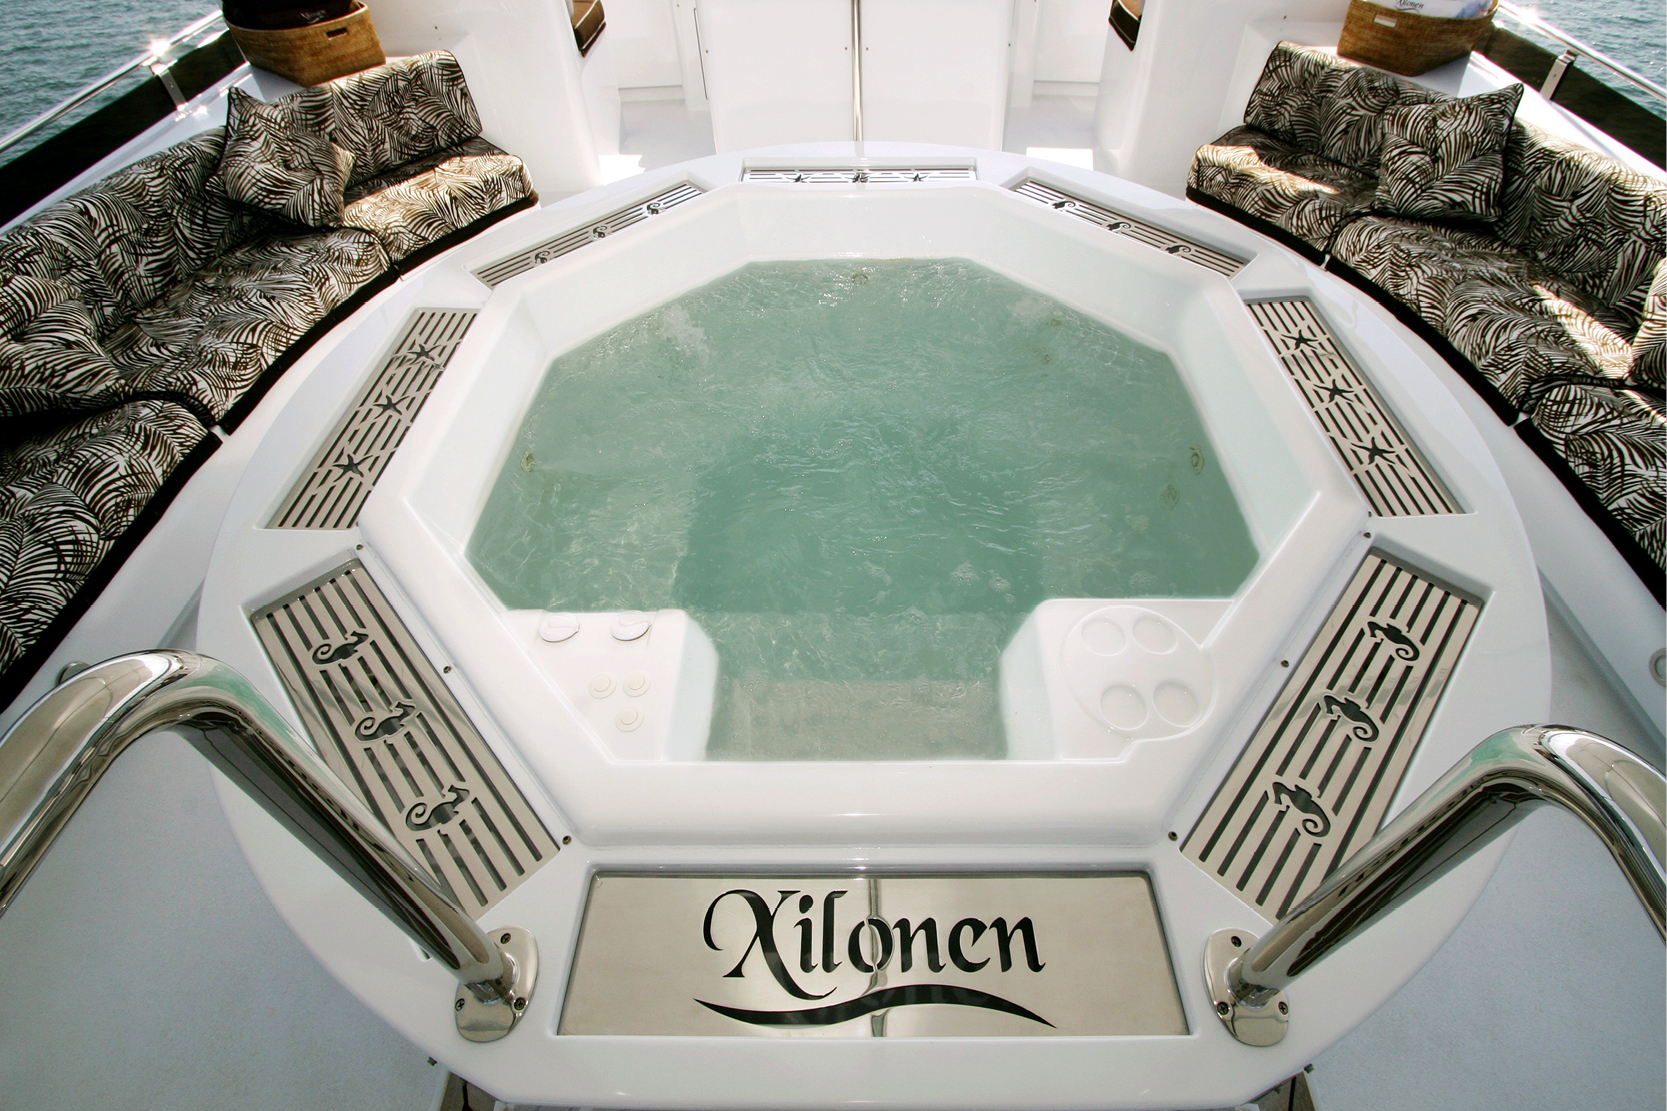 Karen-Lynn-Interior-Design-Yacht-Xilonen_25.jpg